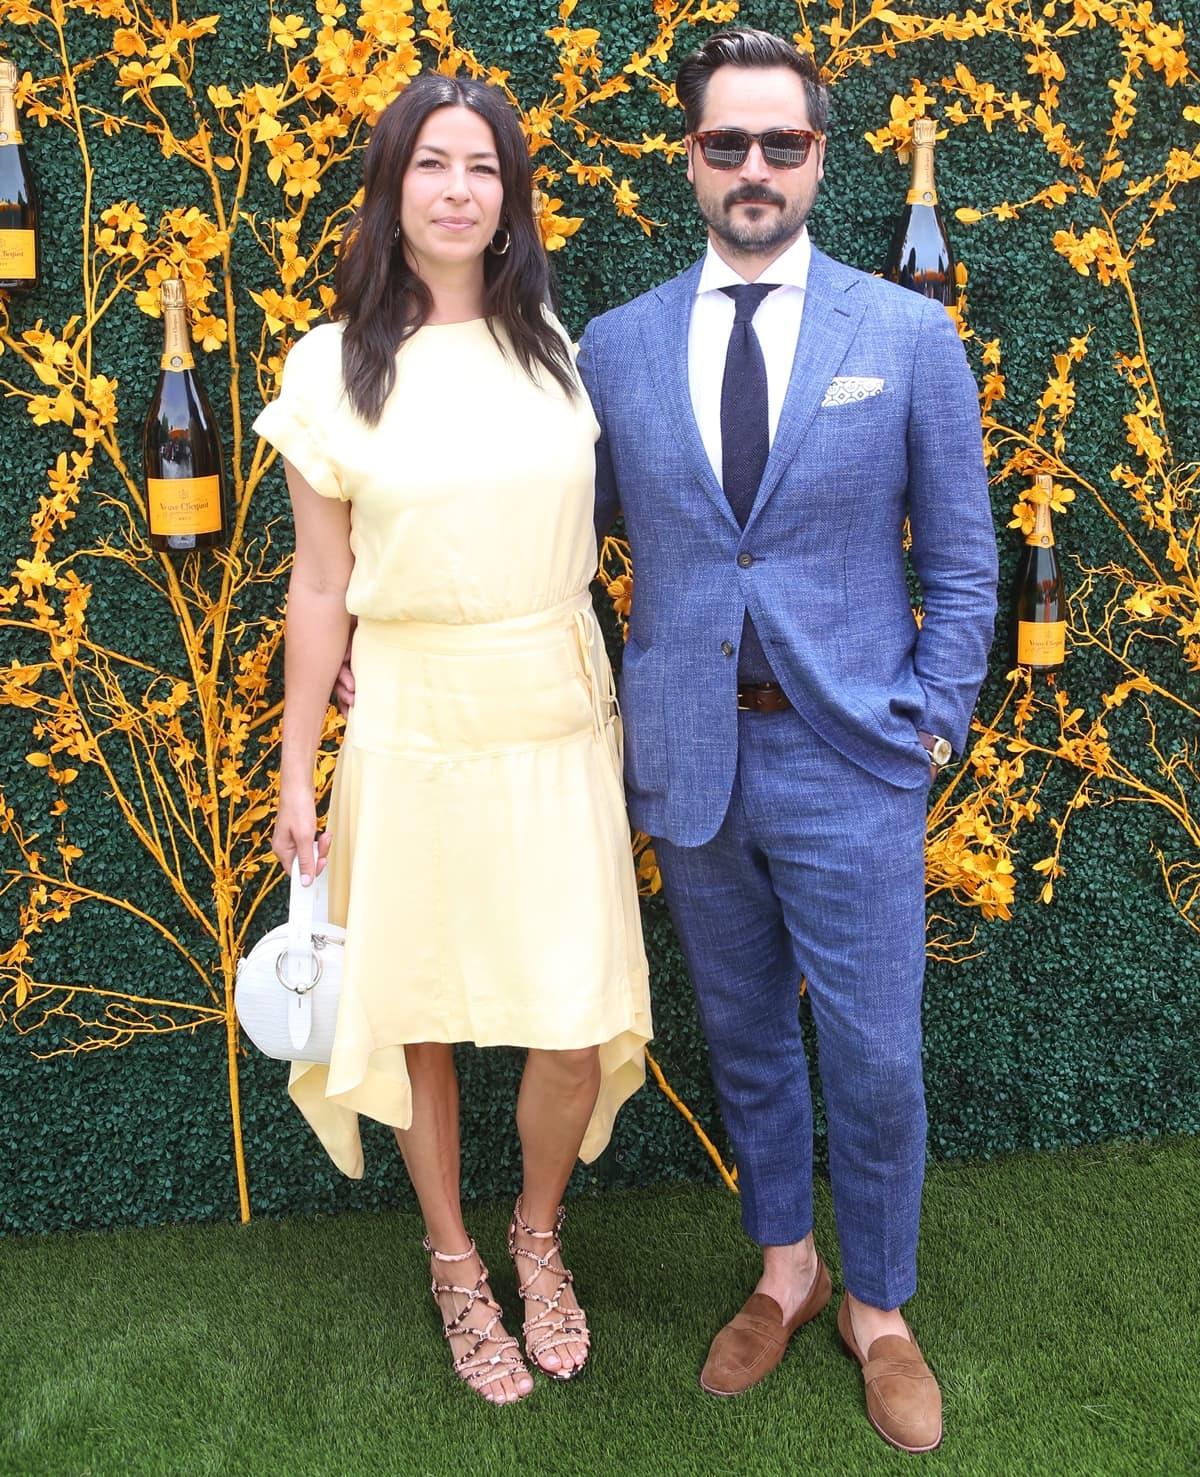 Rebecca Minkoff and her husband Gavin Bell attend the 12th Annual Veuve Clicquot Polo Classic